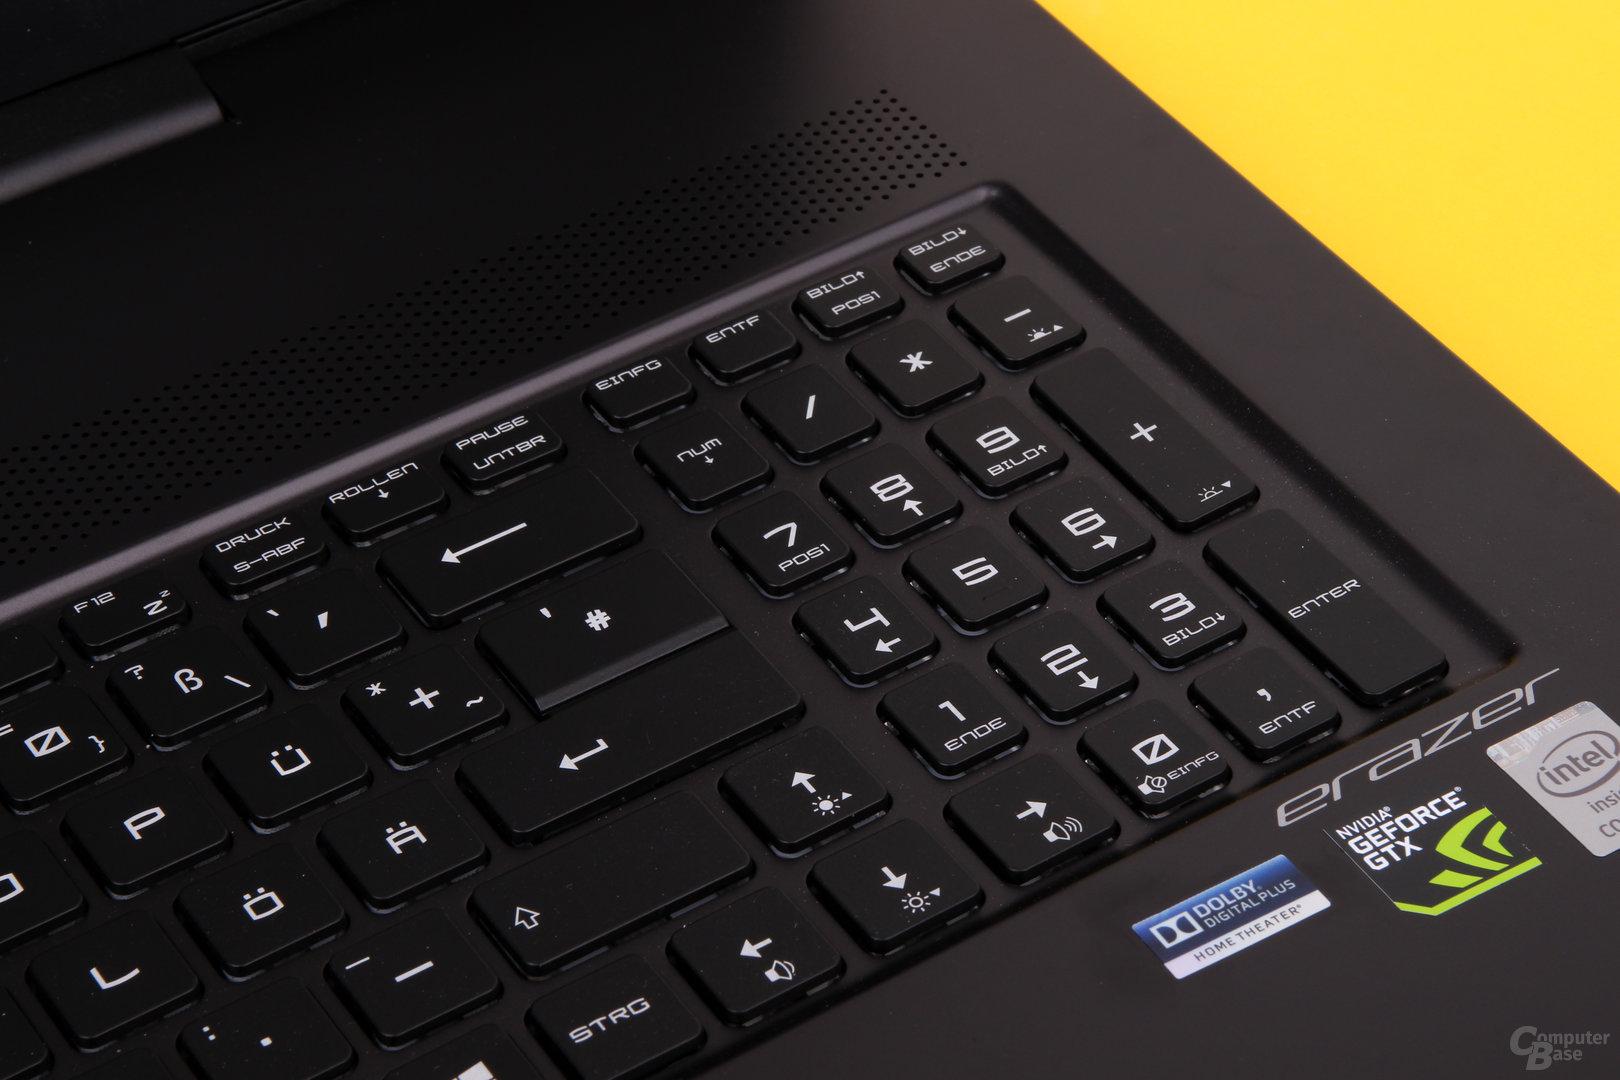 Tastatur mit Ziffernblock